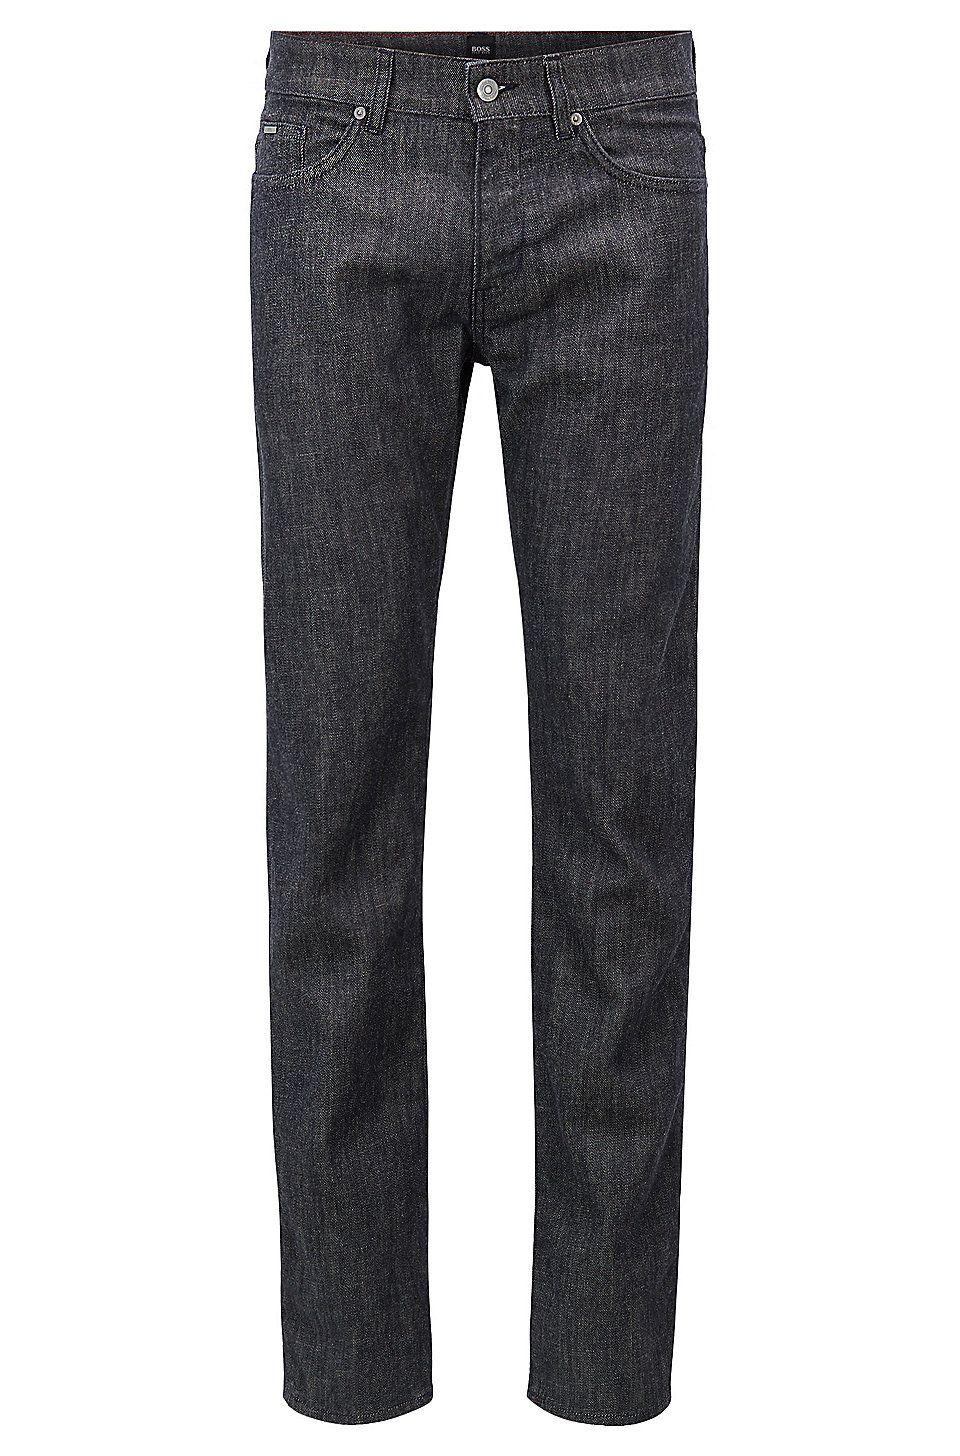 62307171043 HUGO BOSS Slim-fit jeans in Stay Dark Italian stretch denim - Dark Blue  Jeans from BOSS for Men in the official HUGO BOSS Online Store free shipping